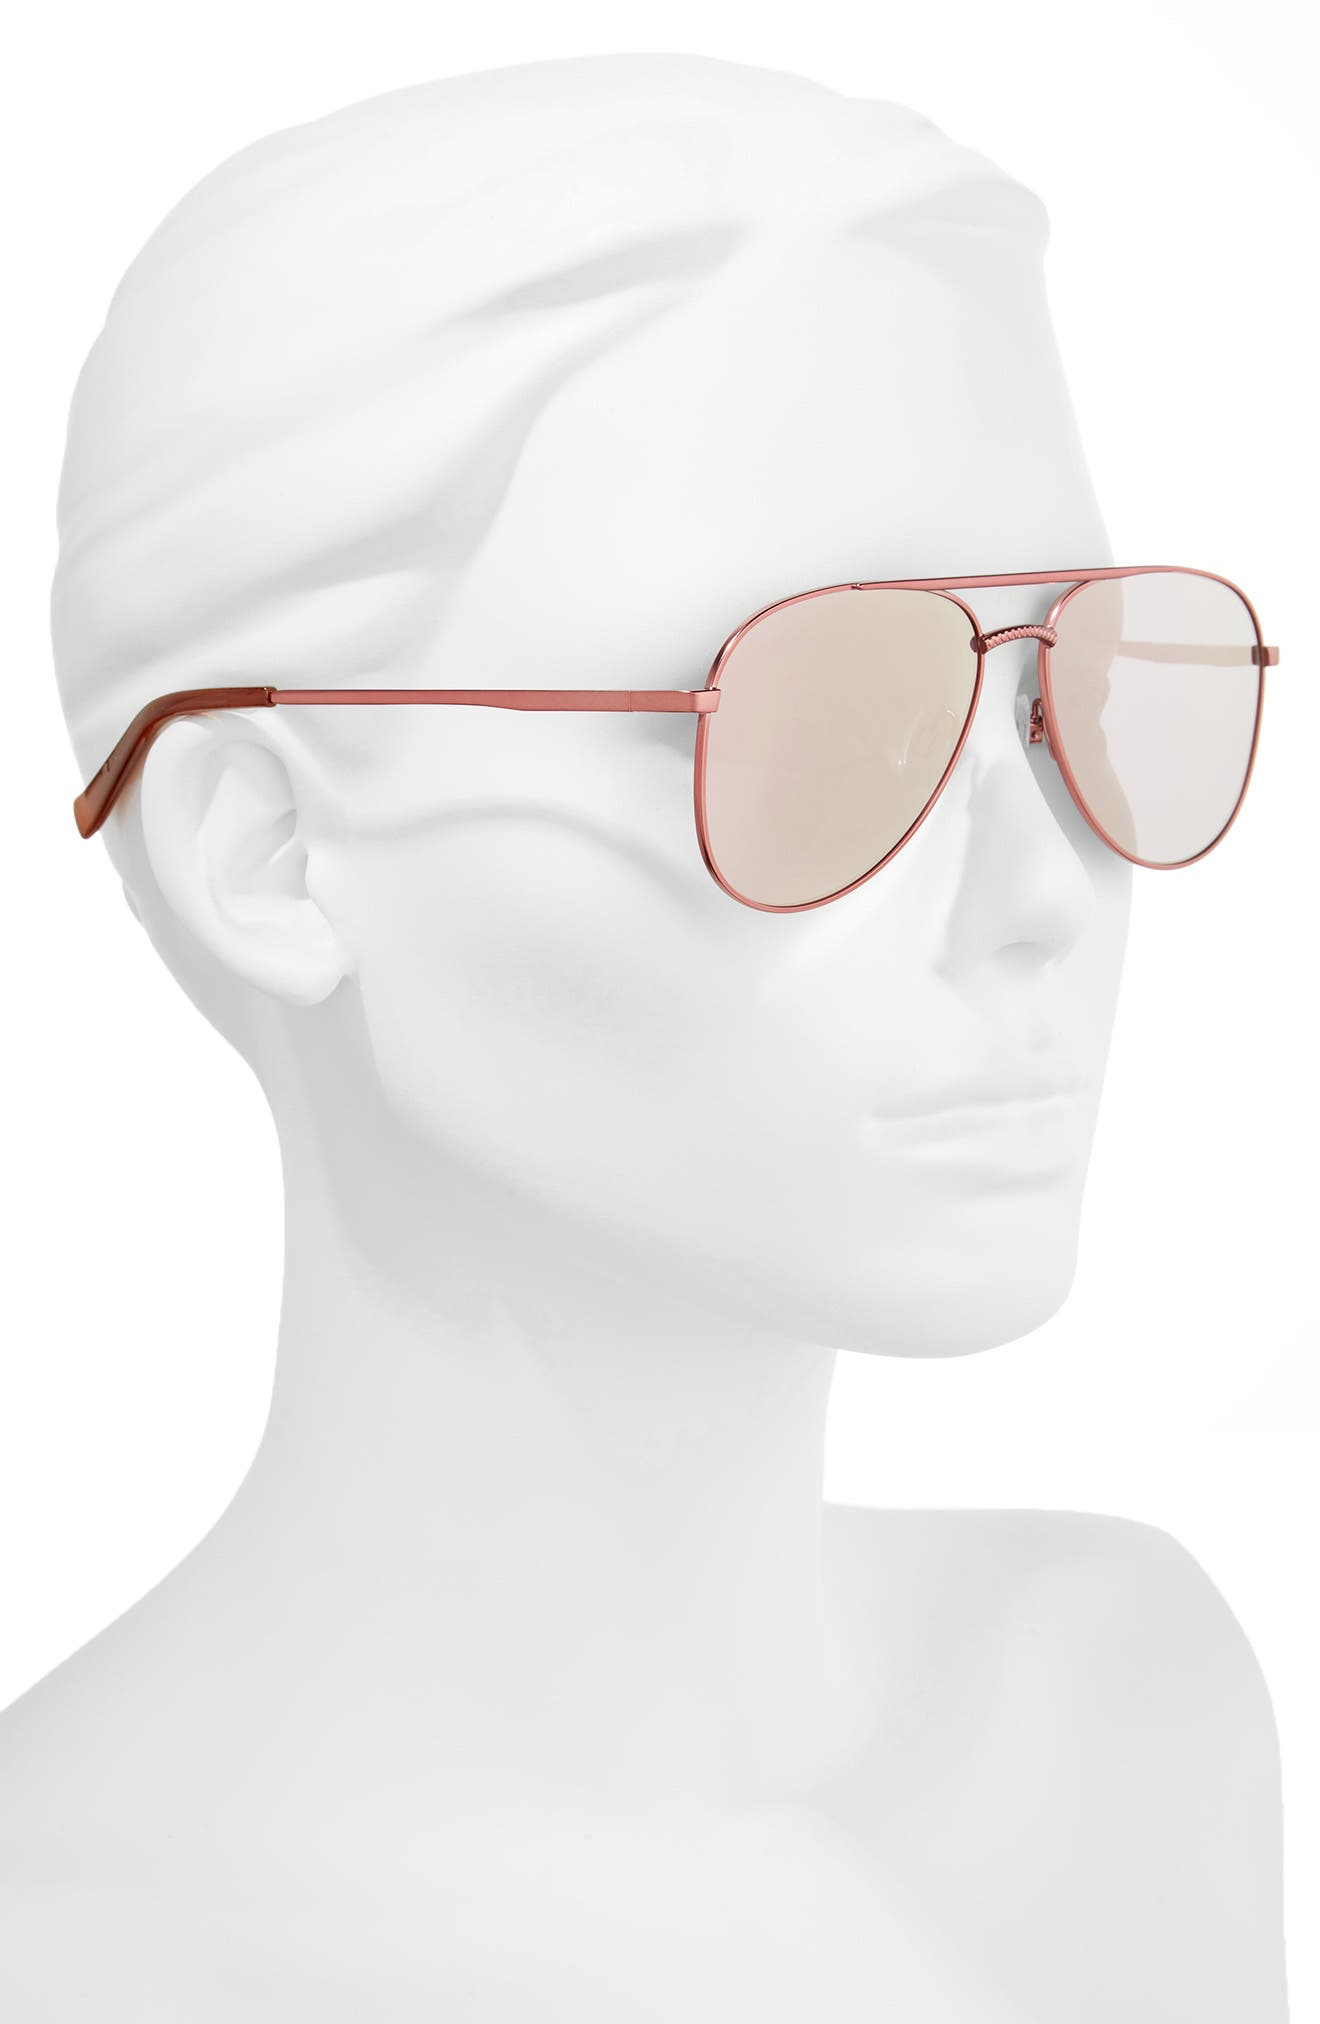 Kingdom 57mm Polarized Aviator Sunglasses,                             Alternate thumbnail 2, color,                             650